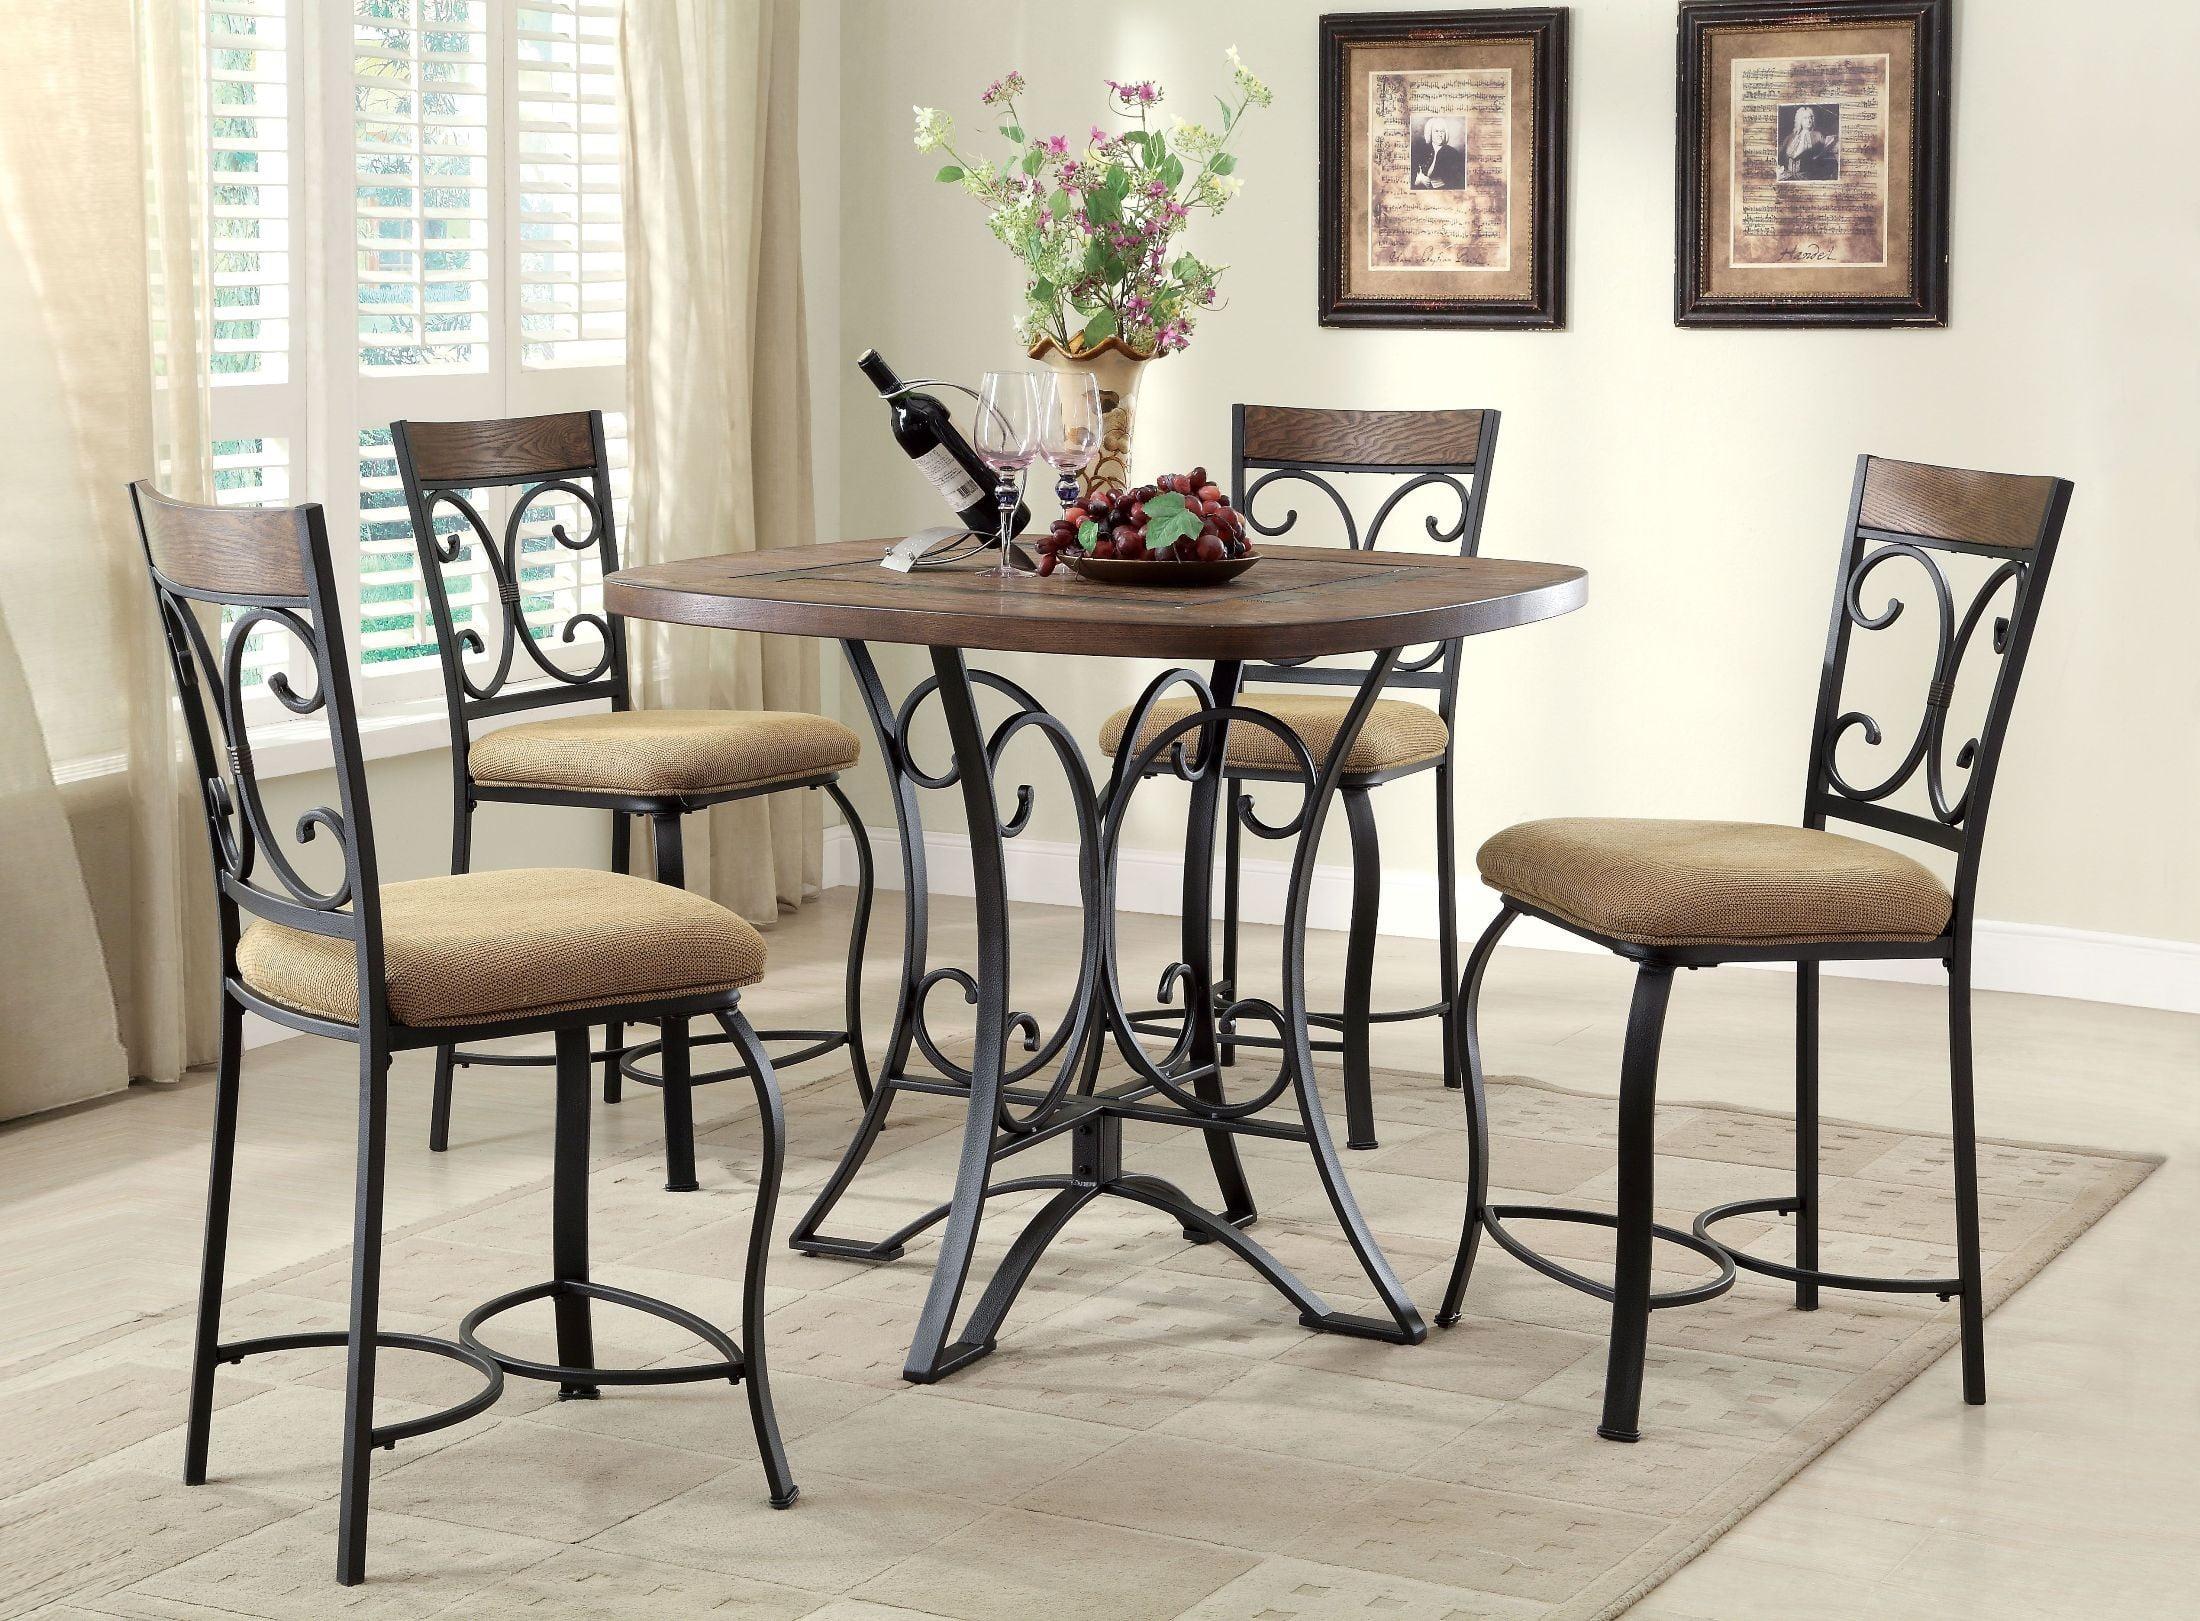 kiele oak and antique black counter height dining room set from acme coleman furniture. Black Bedroom Furniture Sets. Home Design Ideas